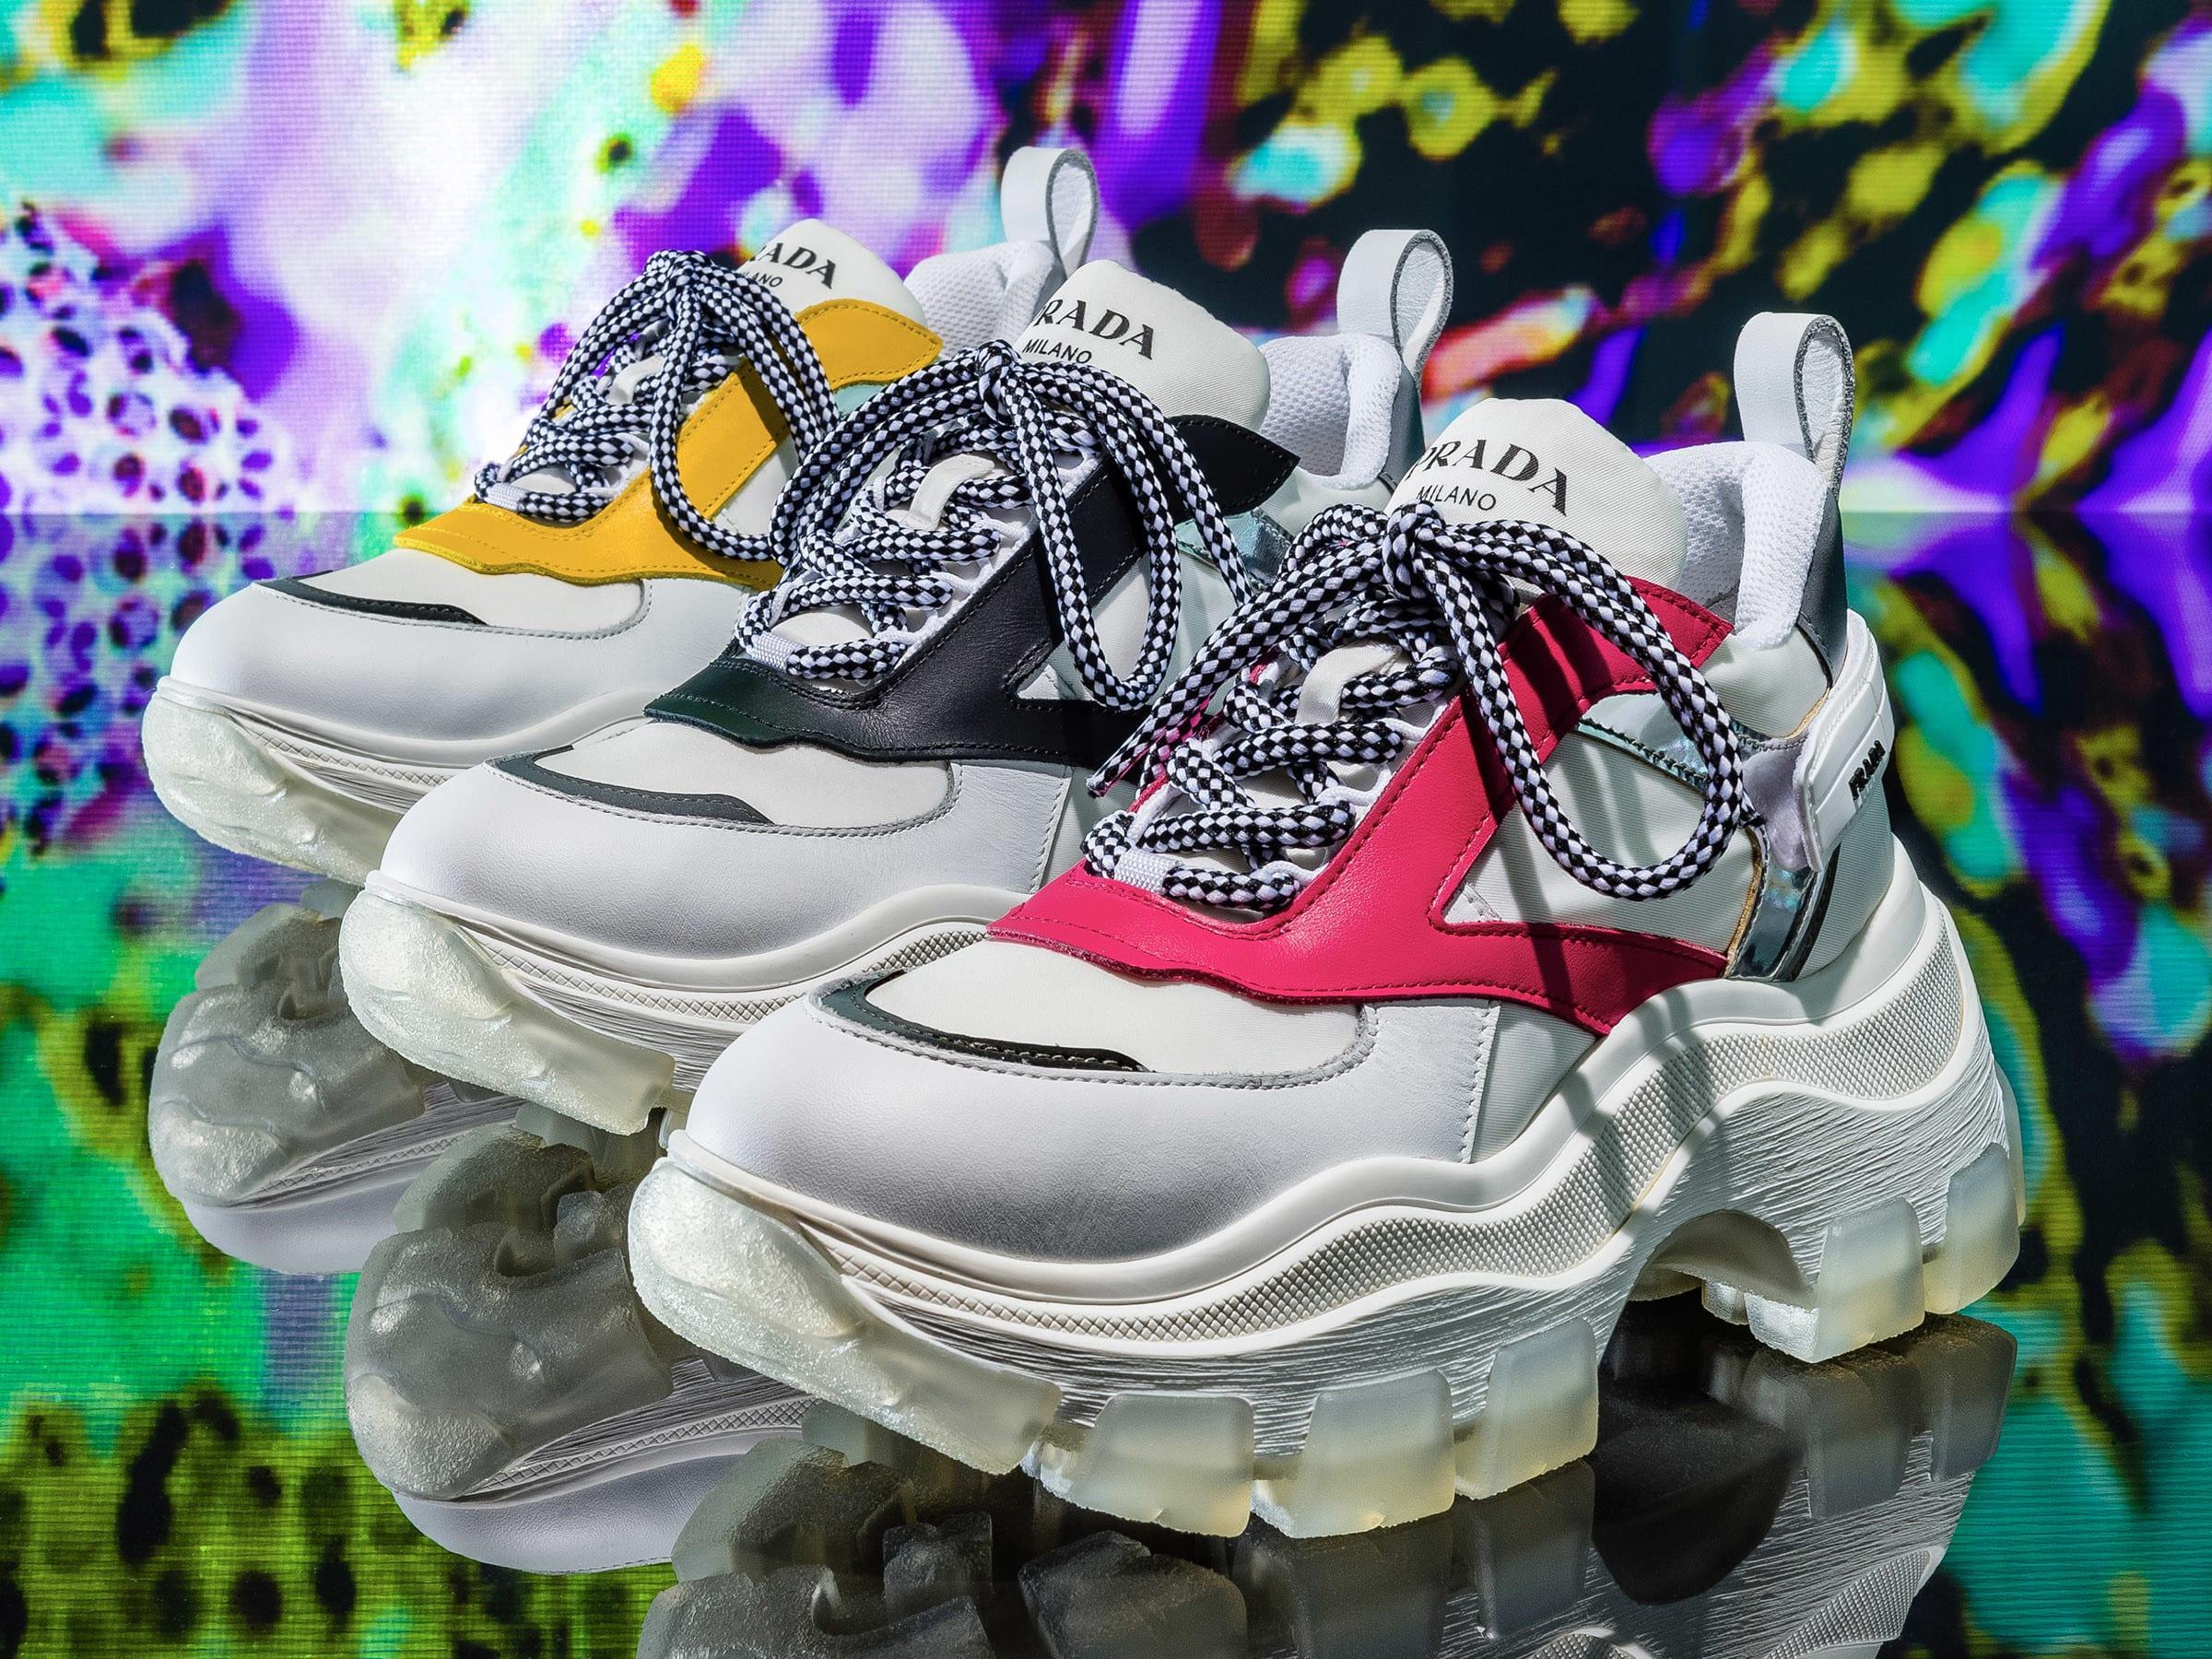 705390c3f244 「プラダ(PRADA)」が、トレッキングシューズに着想した新作シューズを世界に先駆けて販売するポップアップショップを、伊勢丹新宿店本館2階=婦人靴/プロモーション  ...